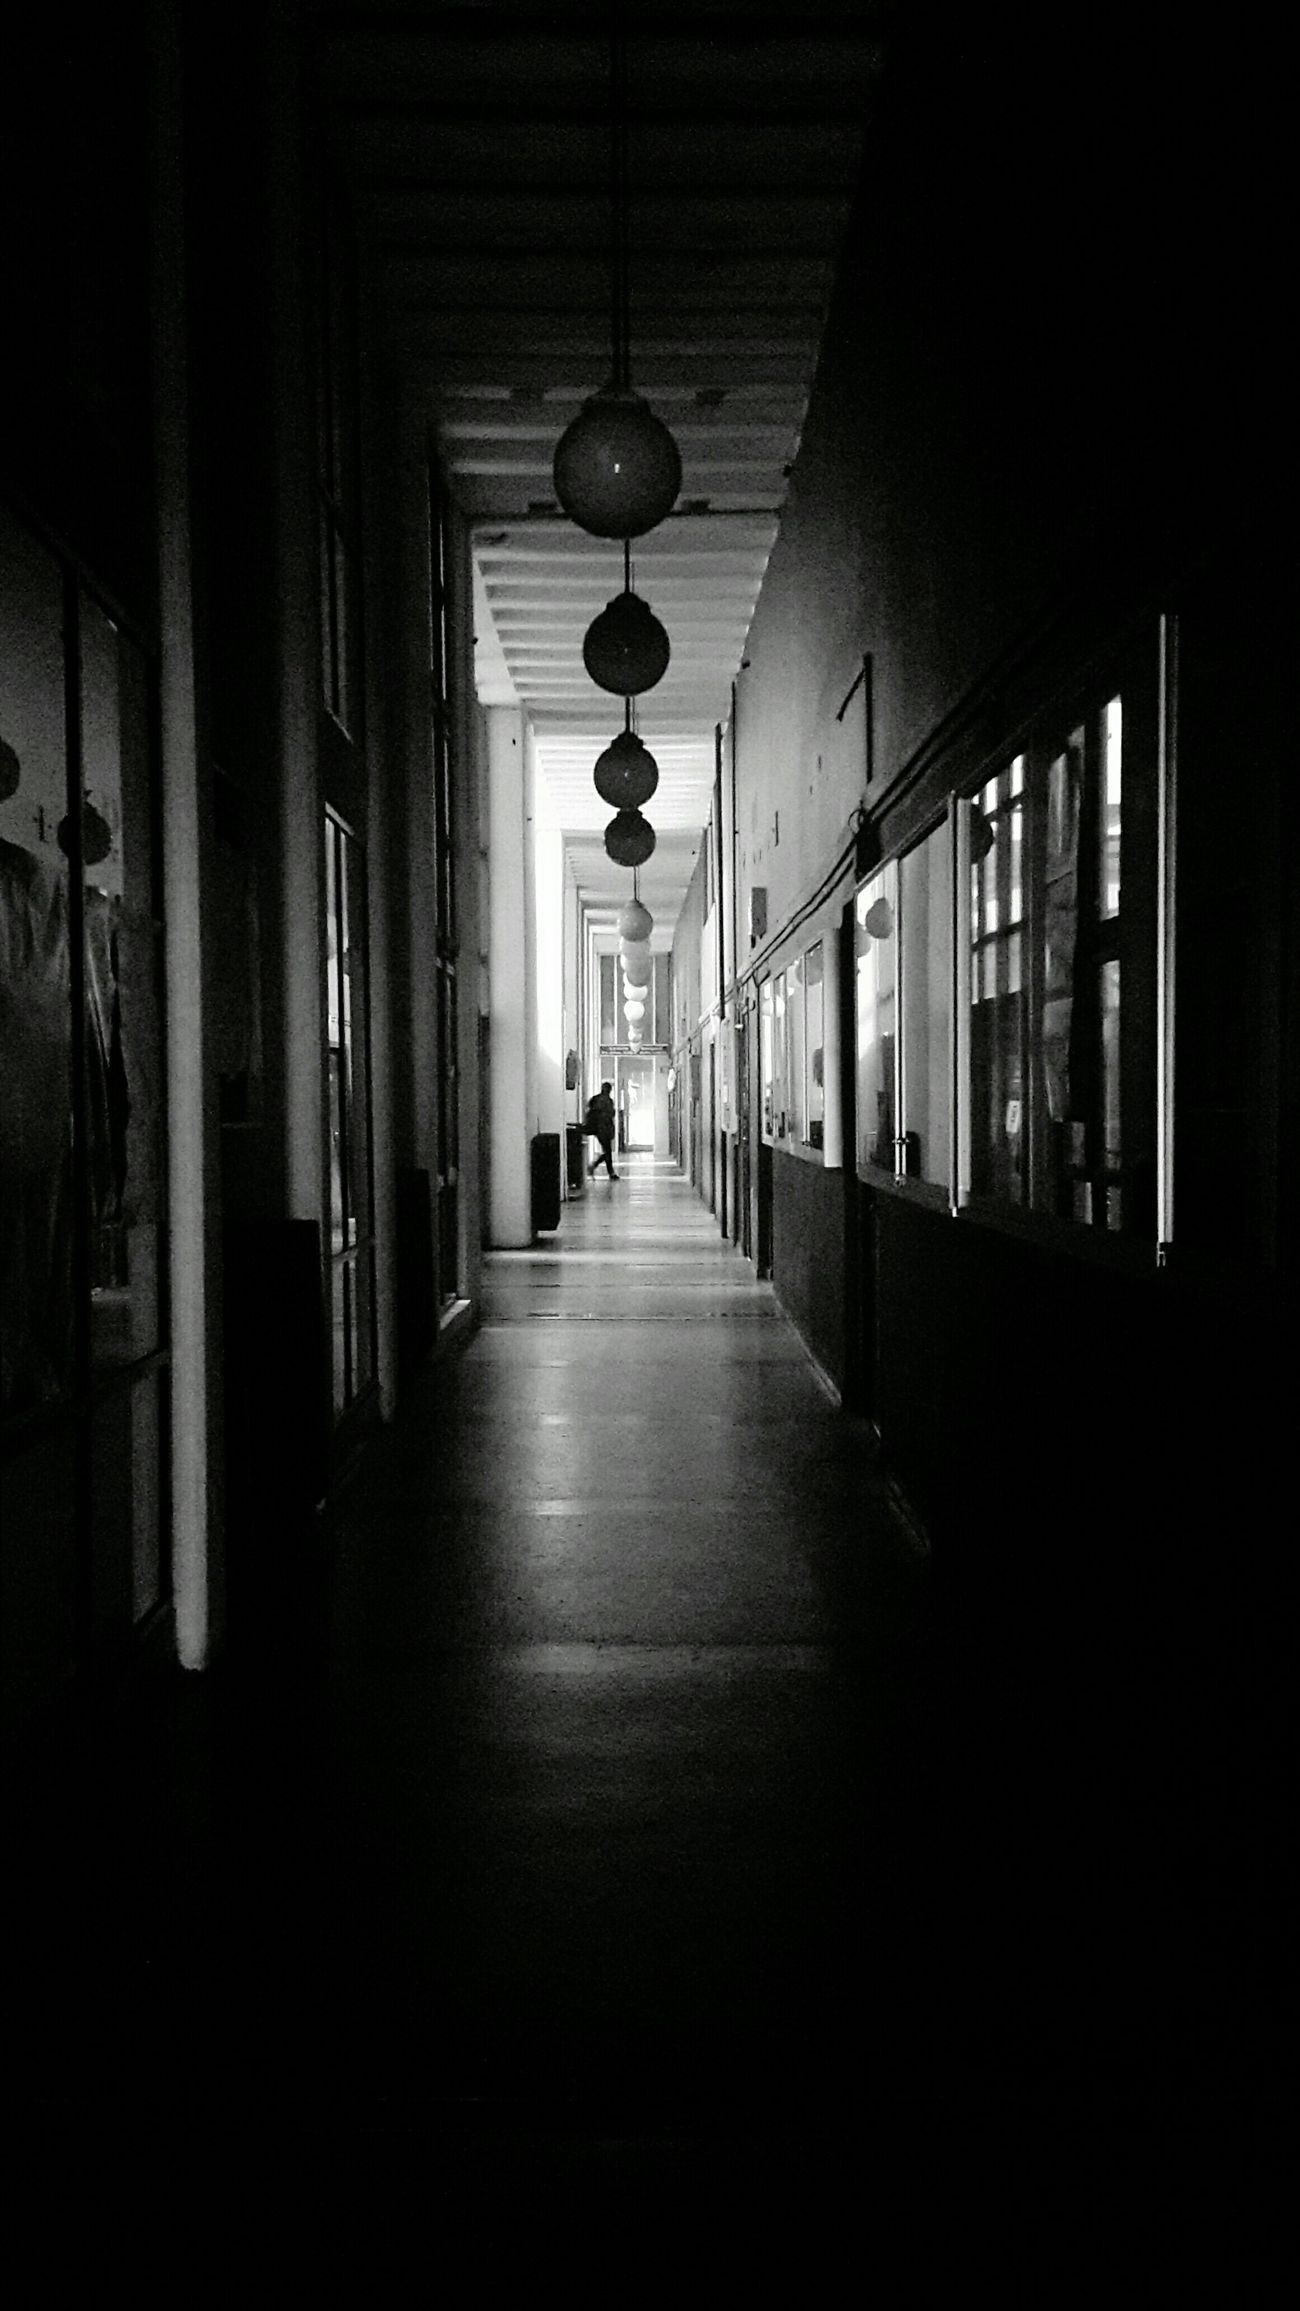 Endlessness MSGSU Mimarsinanuniversity Mimarsinanguzelsanatlaruniversitesi Istanbul Turkey Darkness And Light Blackandwhite Perspective Architectural Architectural Photography